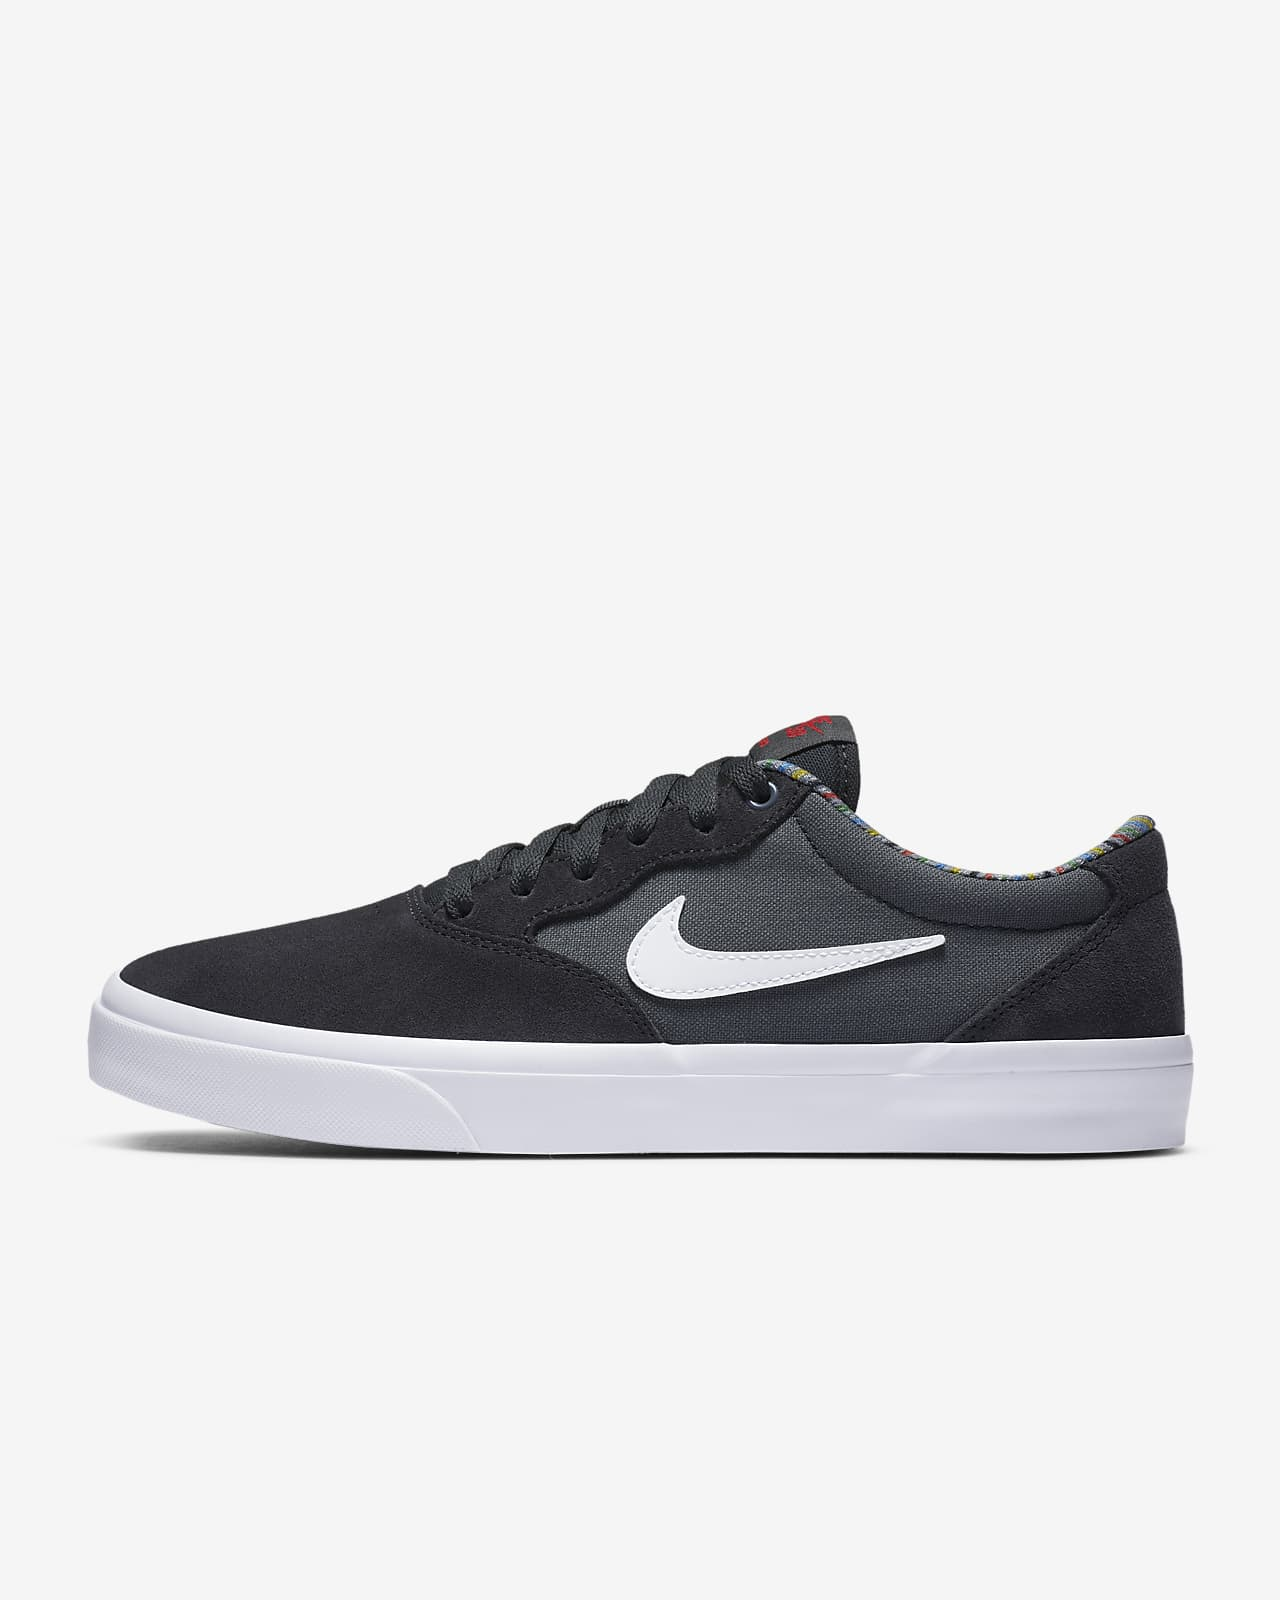 Calzado de skateboarding Nike SB Chron Solarsoft Premium